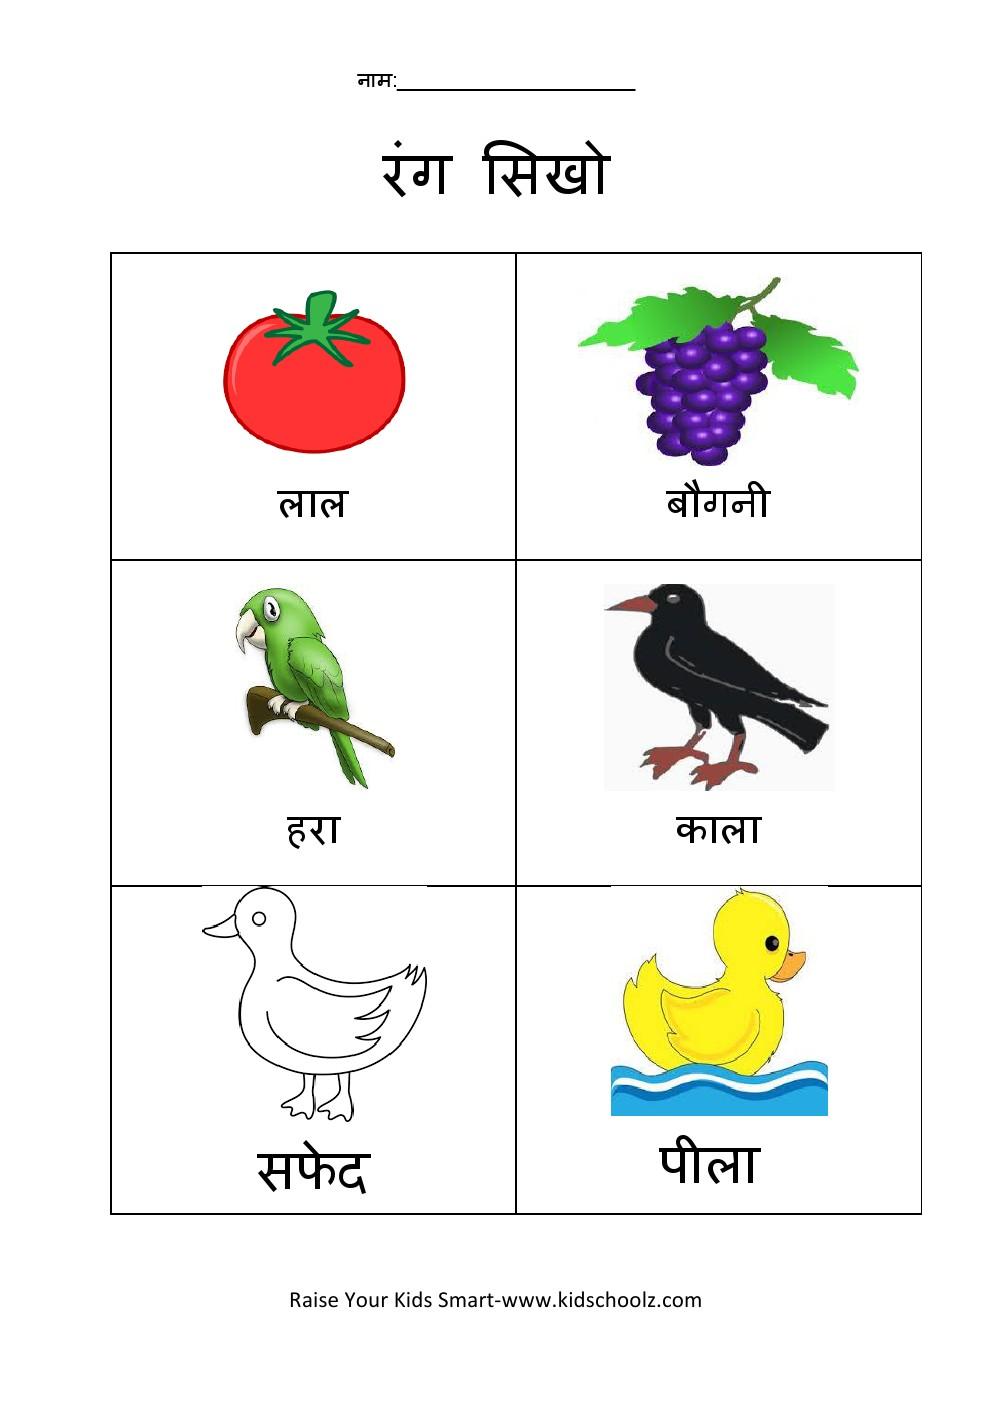 Workbooks hindi worksheets for ukg students : Hindi- Colors Worksheet - Kidschoolz